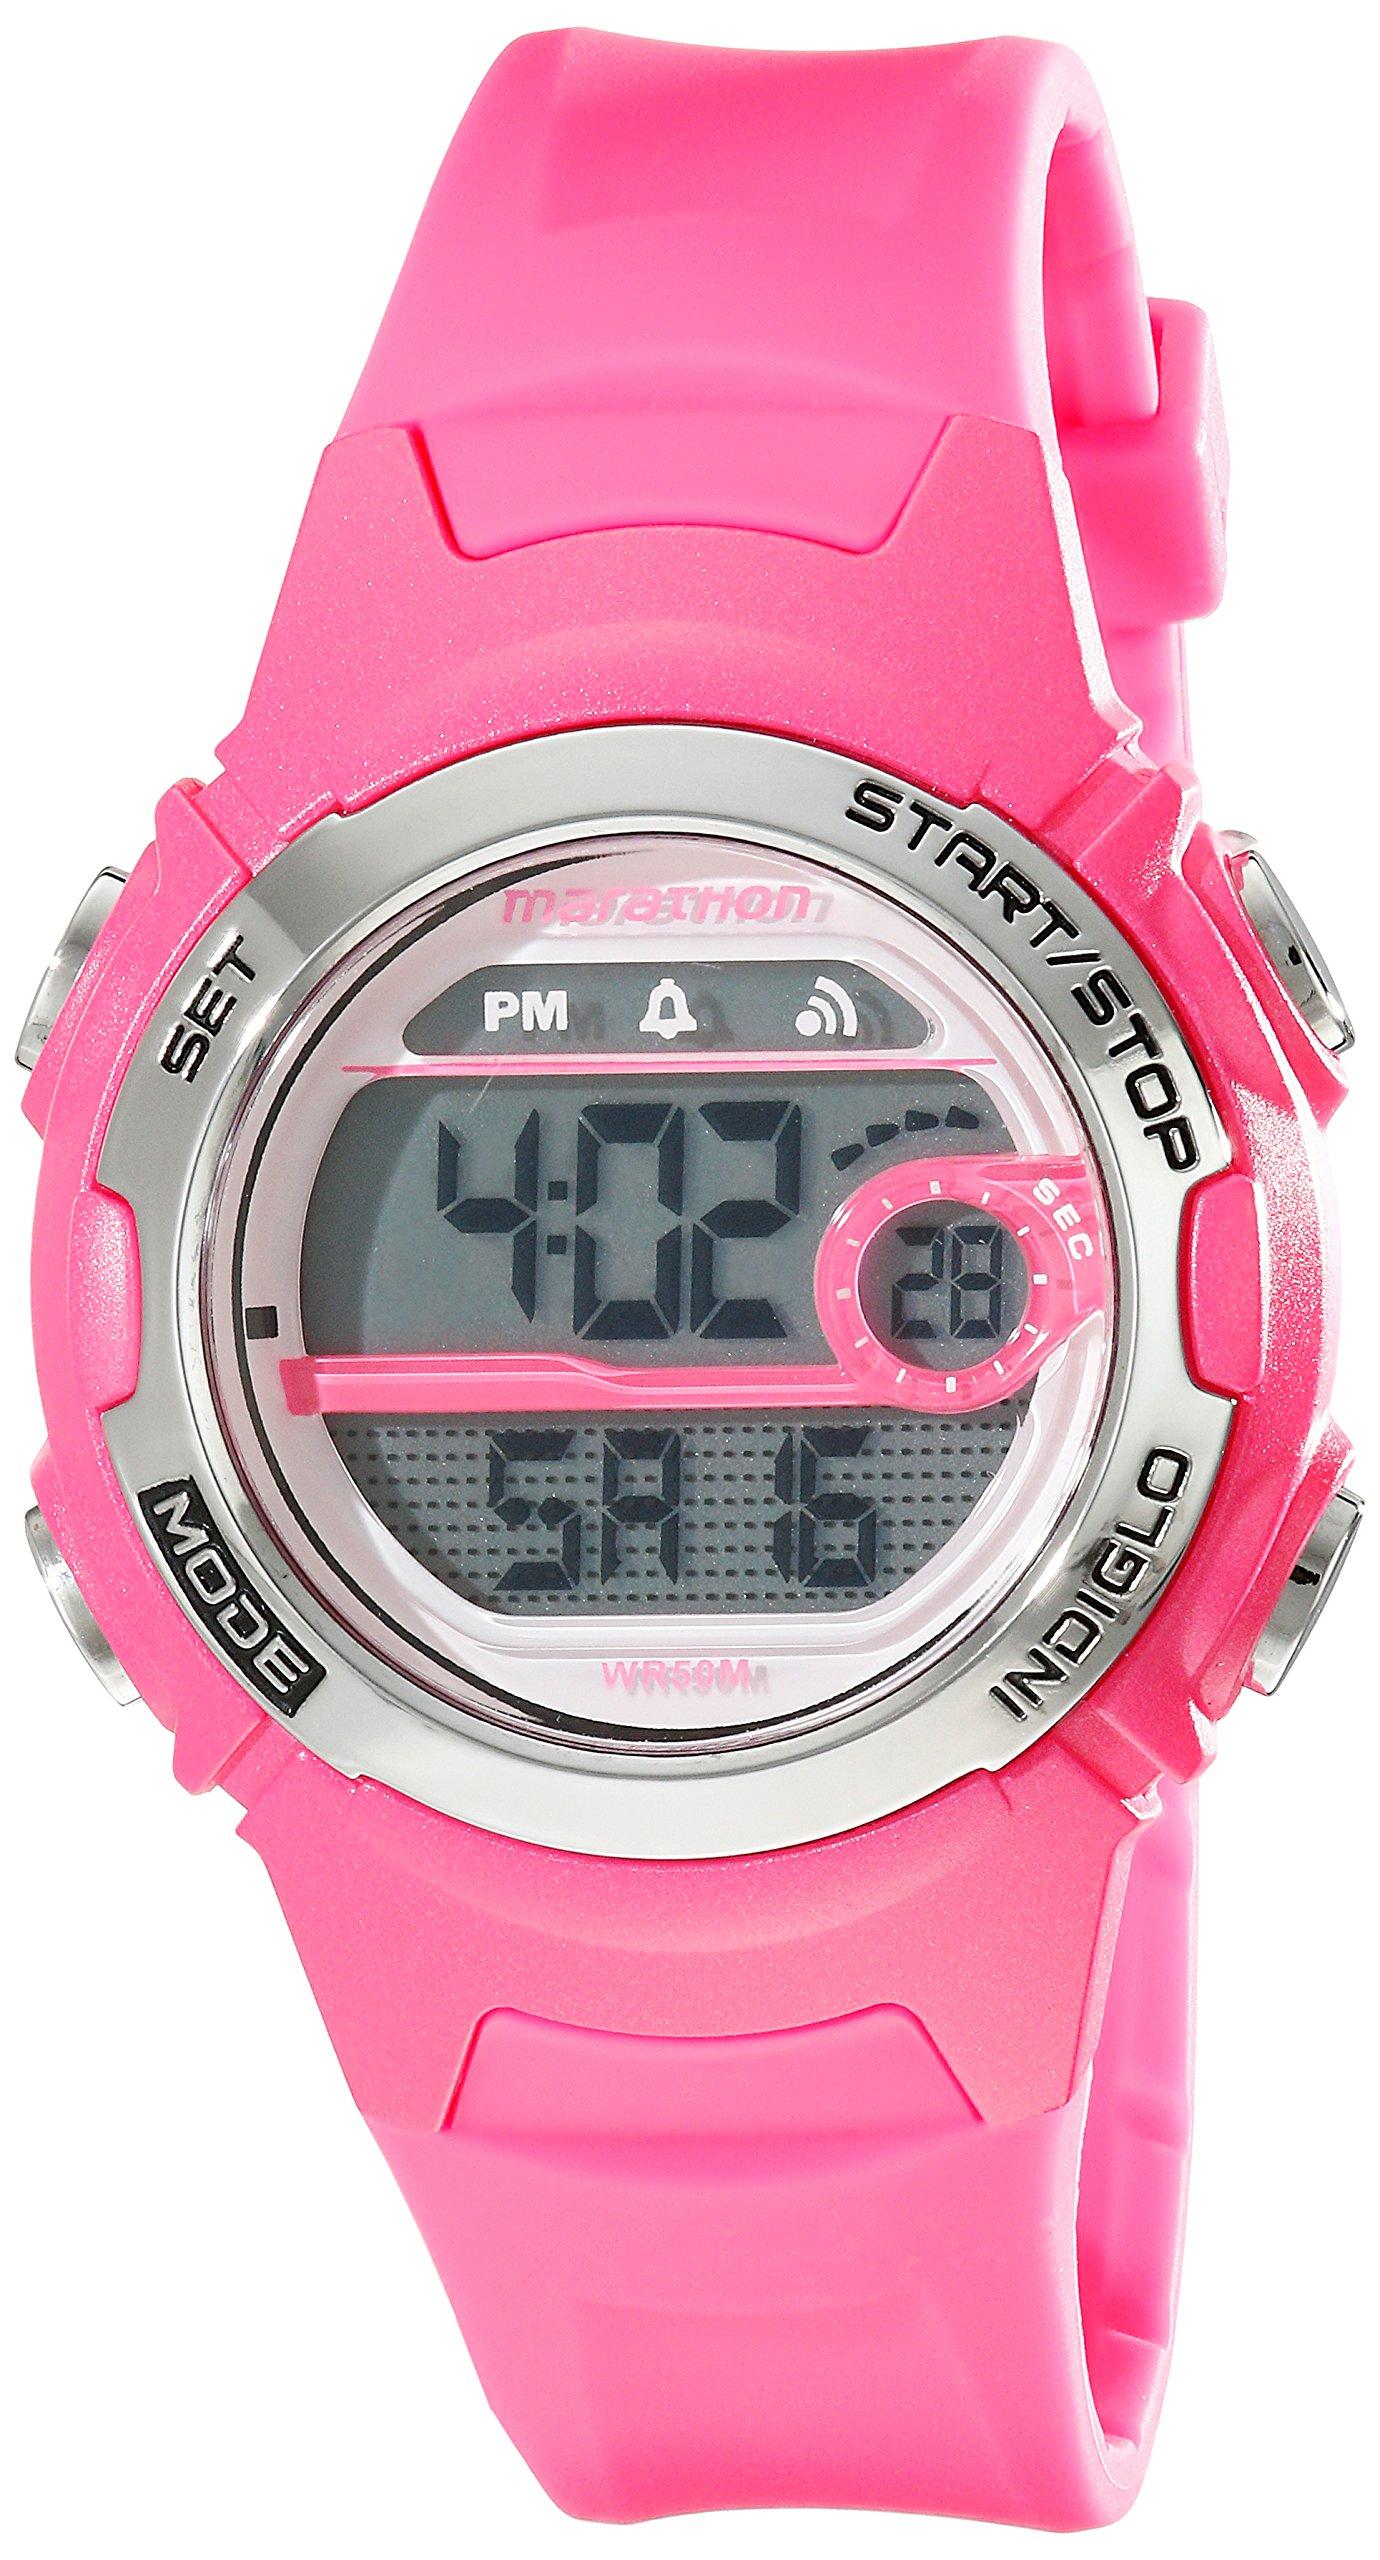 Marathon by Timex Women's T5K771 Digital Mid-Size Bright Pink Resin Strap Watch